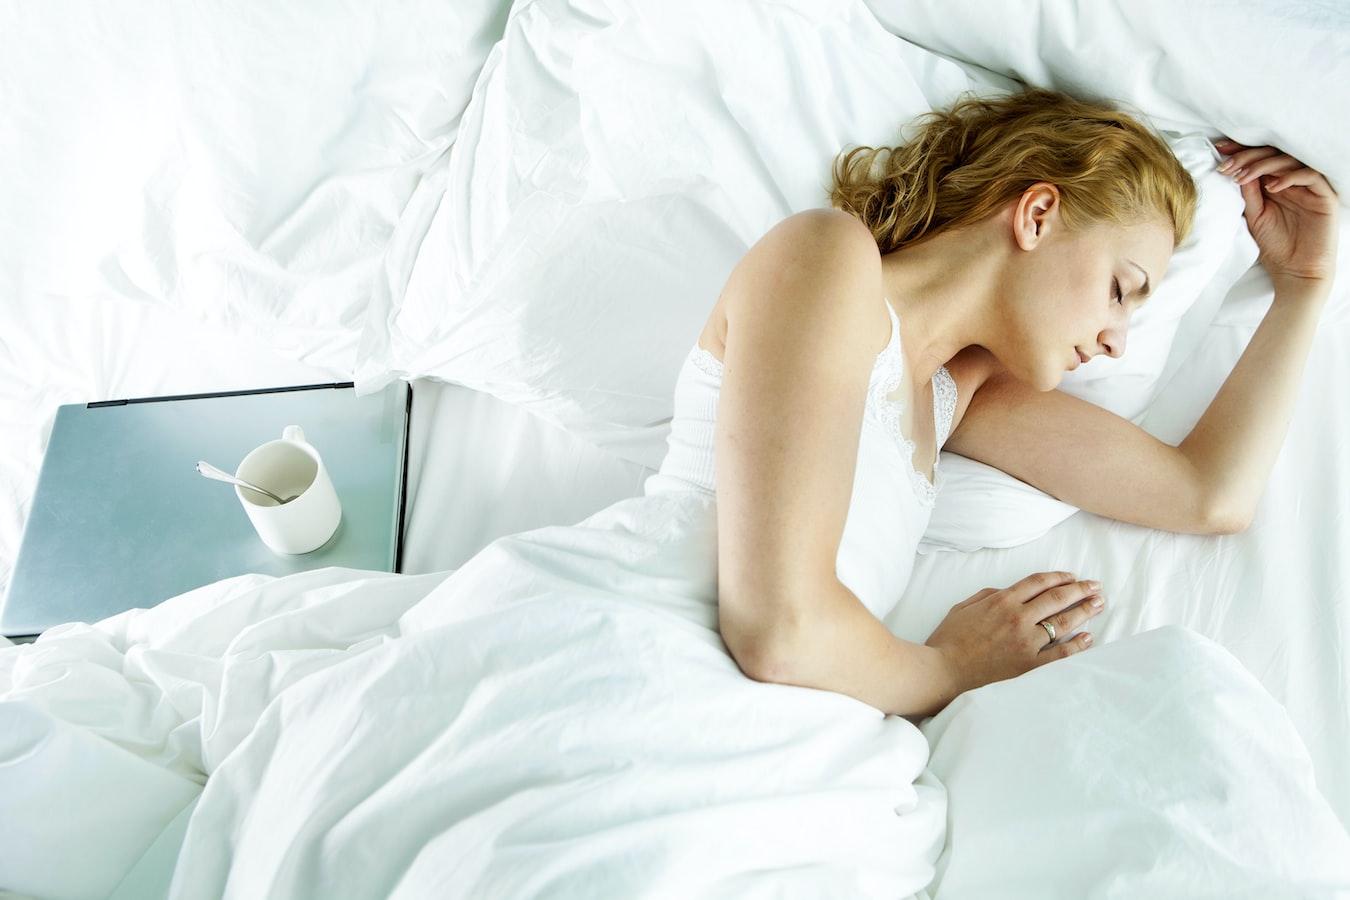 Woman sleeping next to laptop